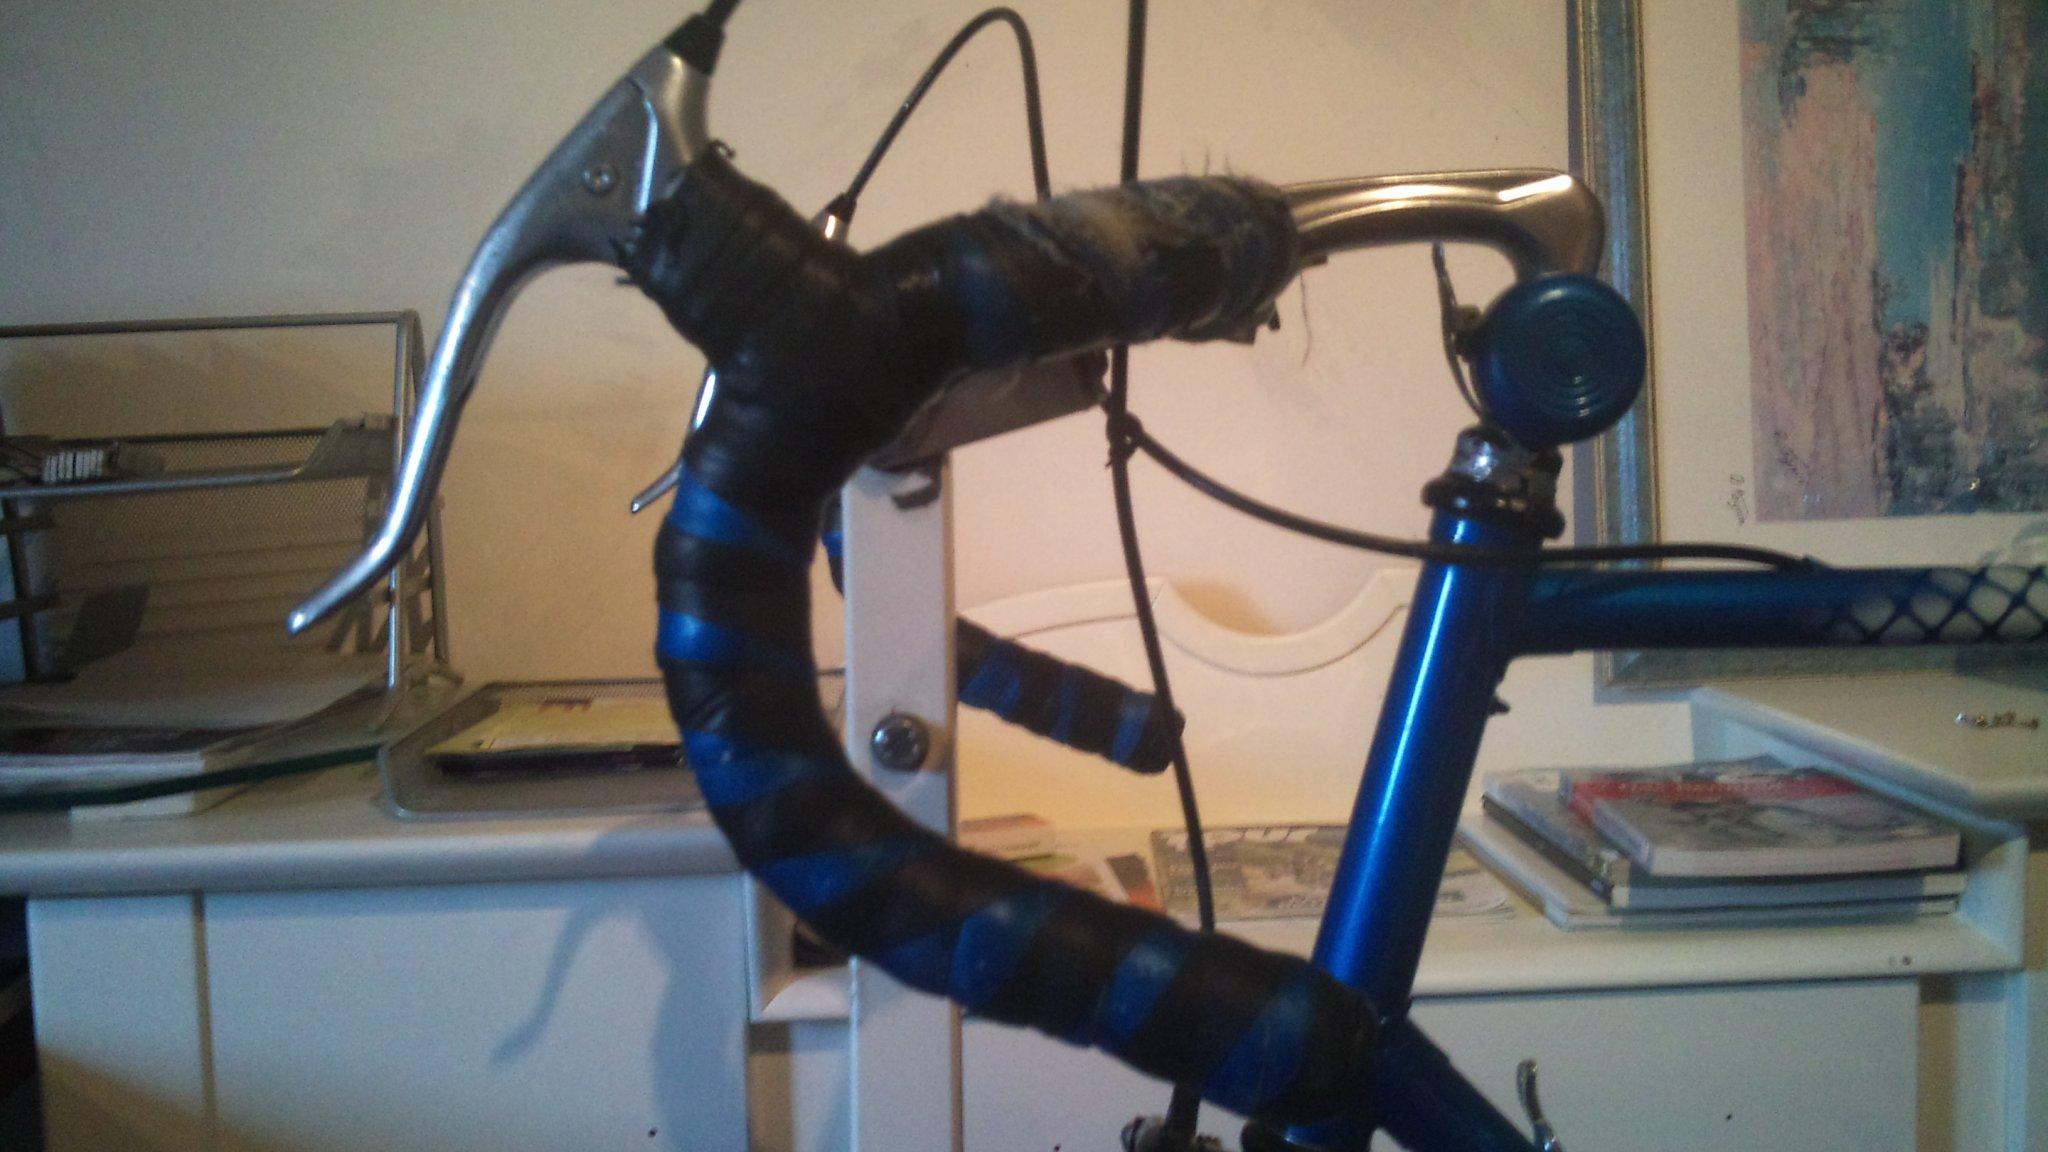 Aufbau eines Singlespeed Bikes - Fahrrad: volunteeralert.com